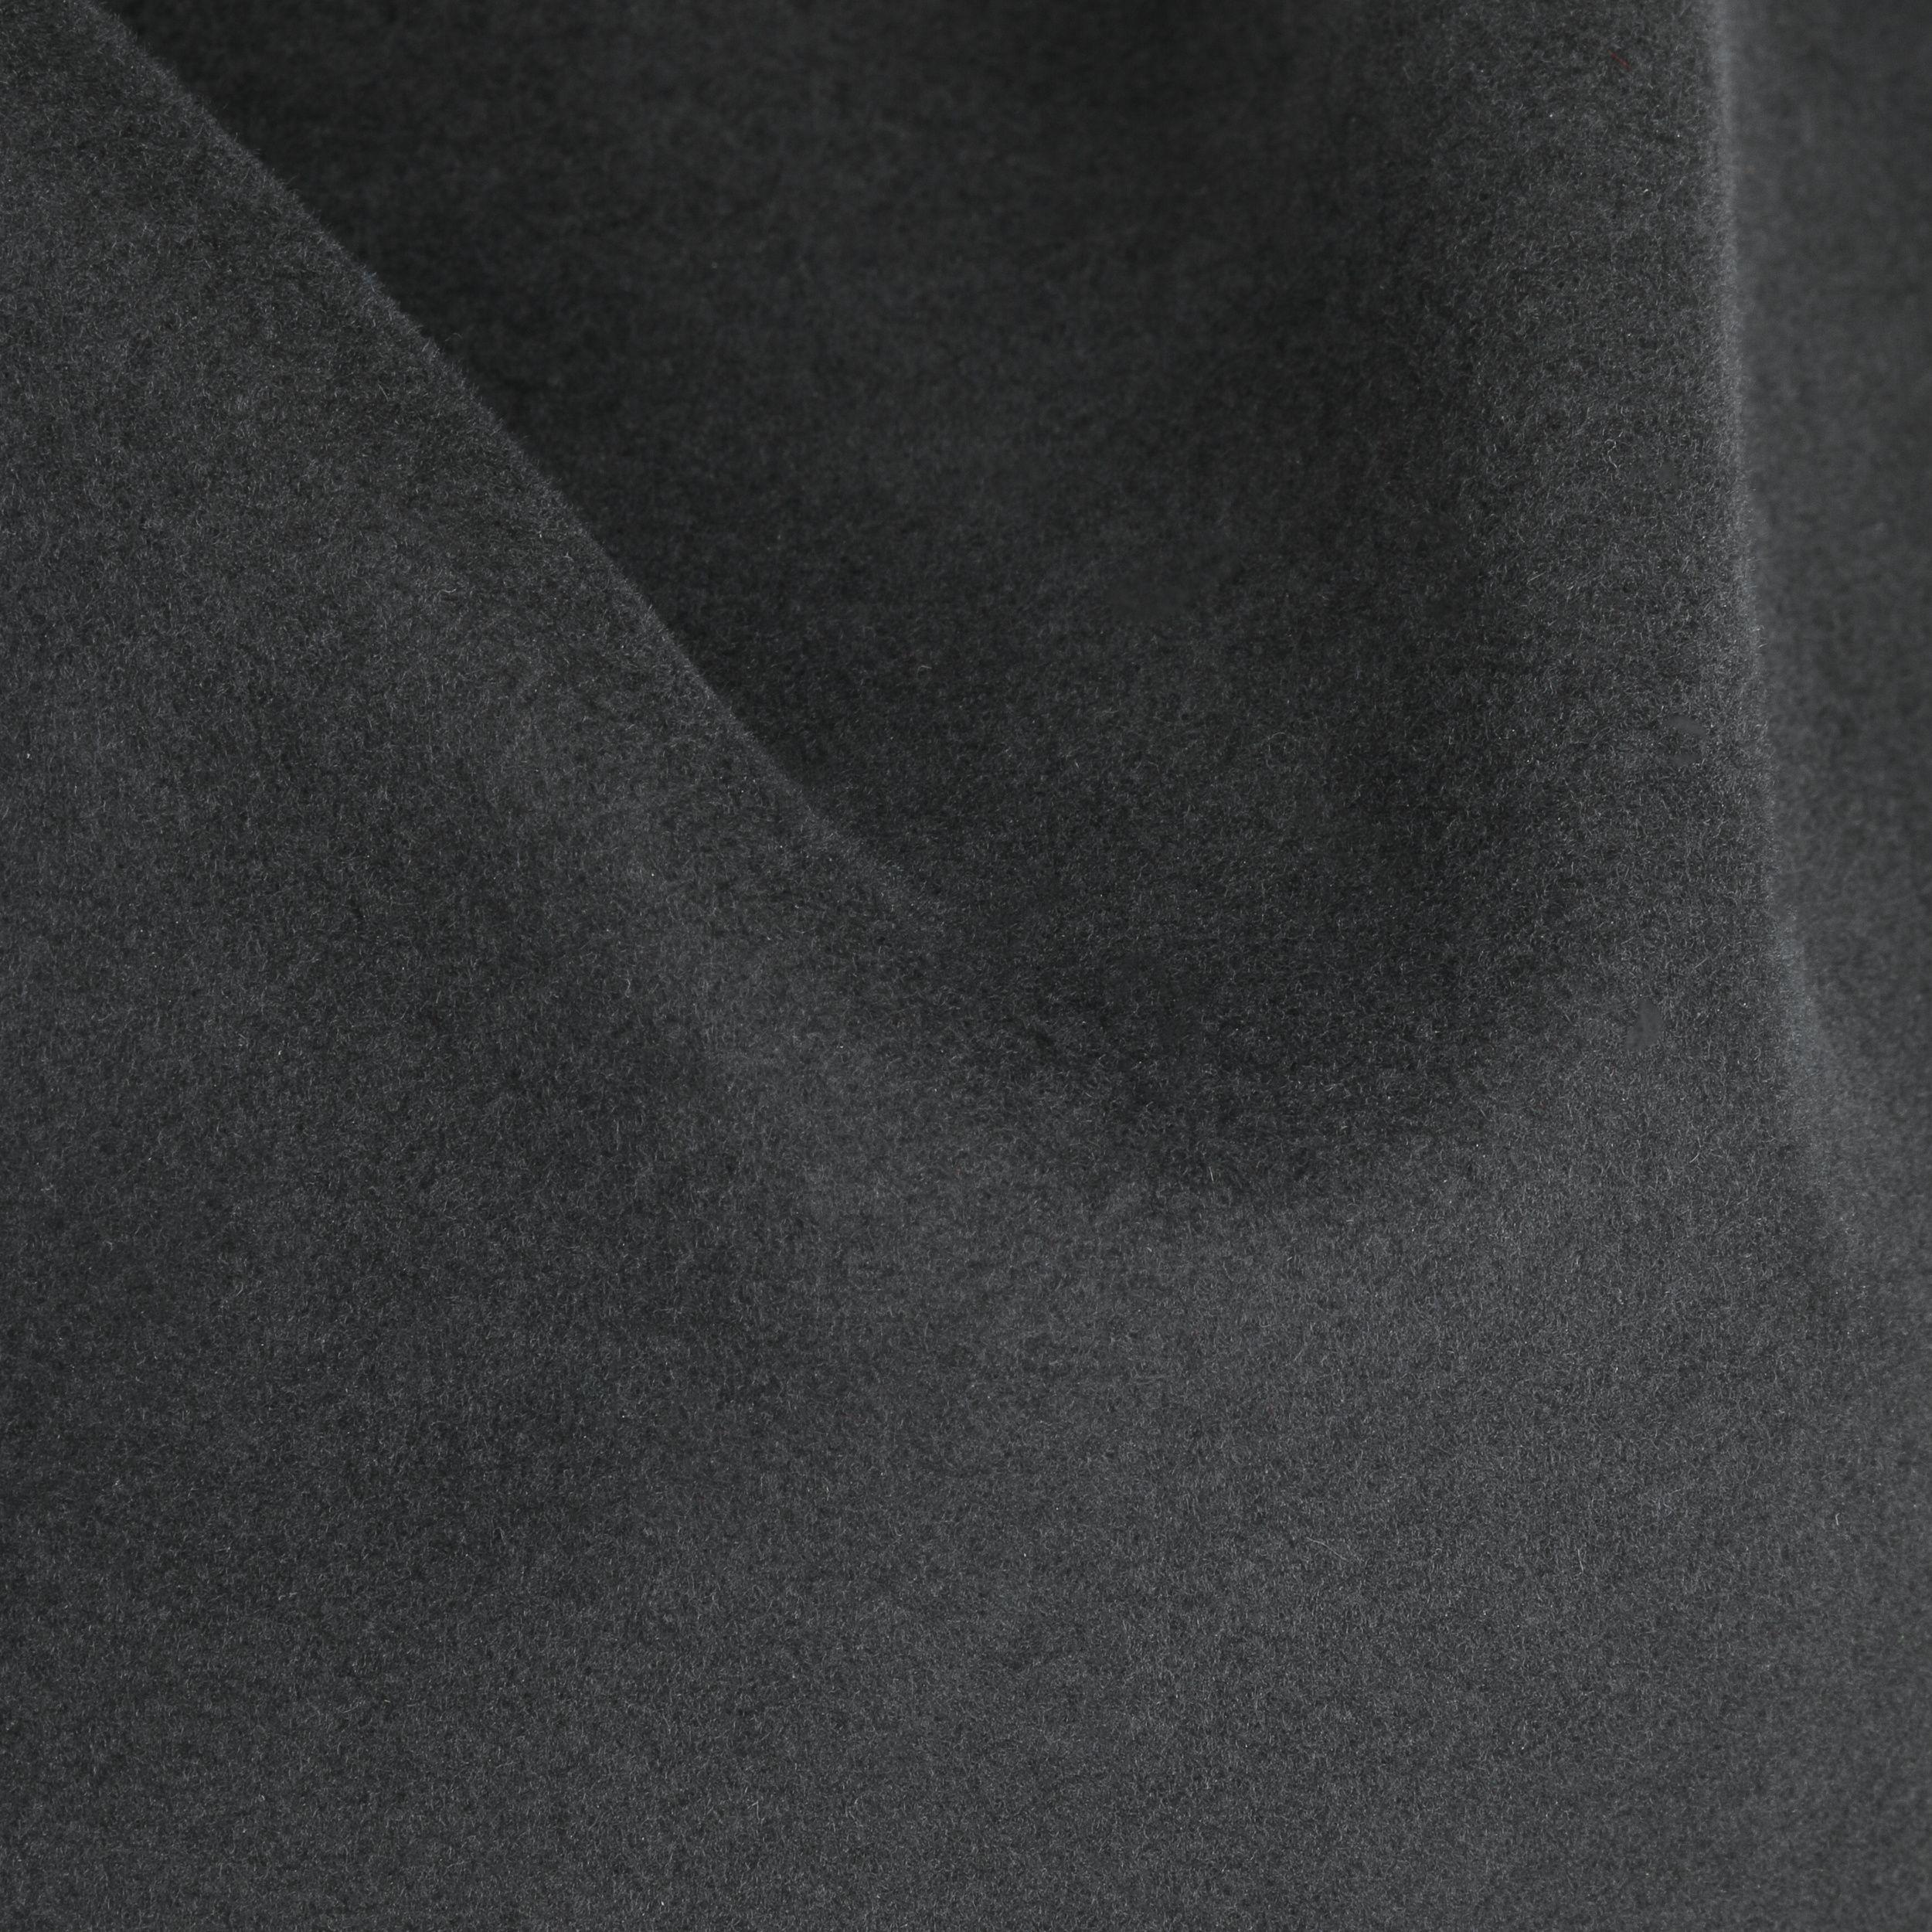 Vernard Wolvilthoed met Kasjmier donkergrijs